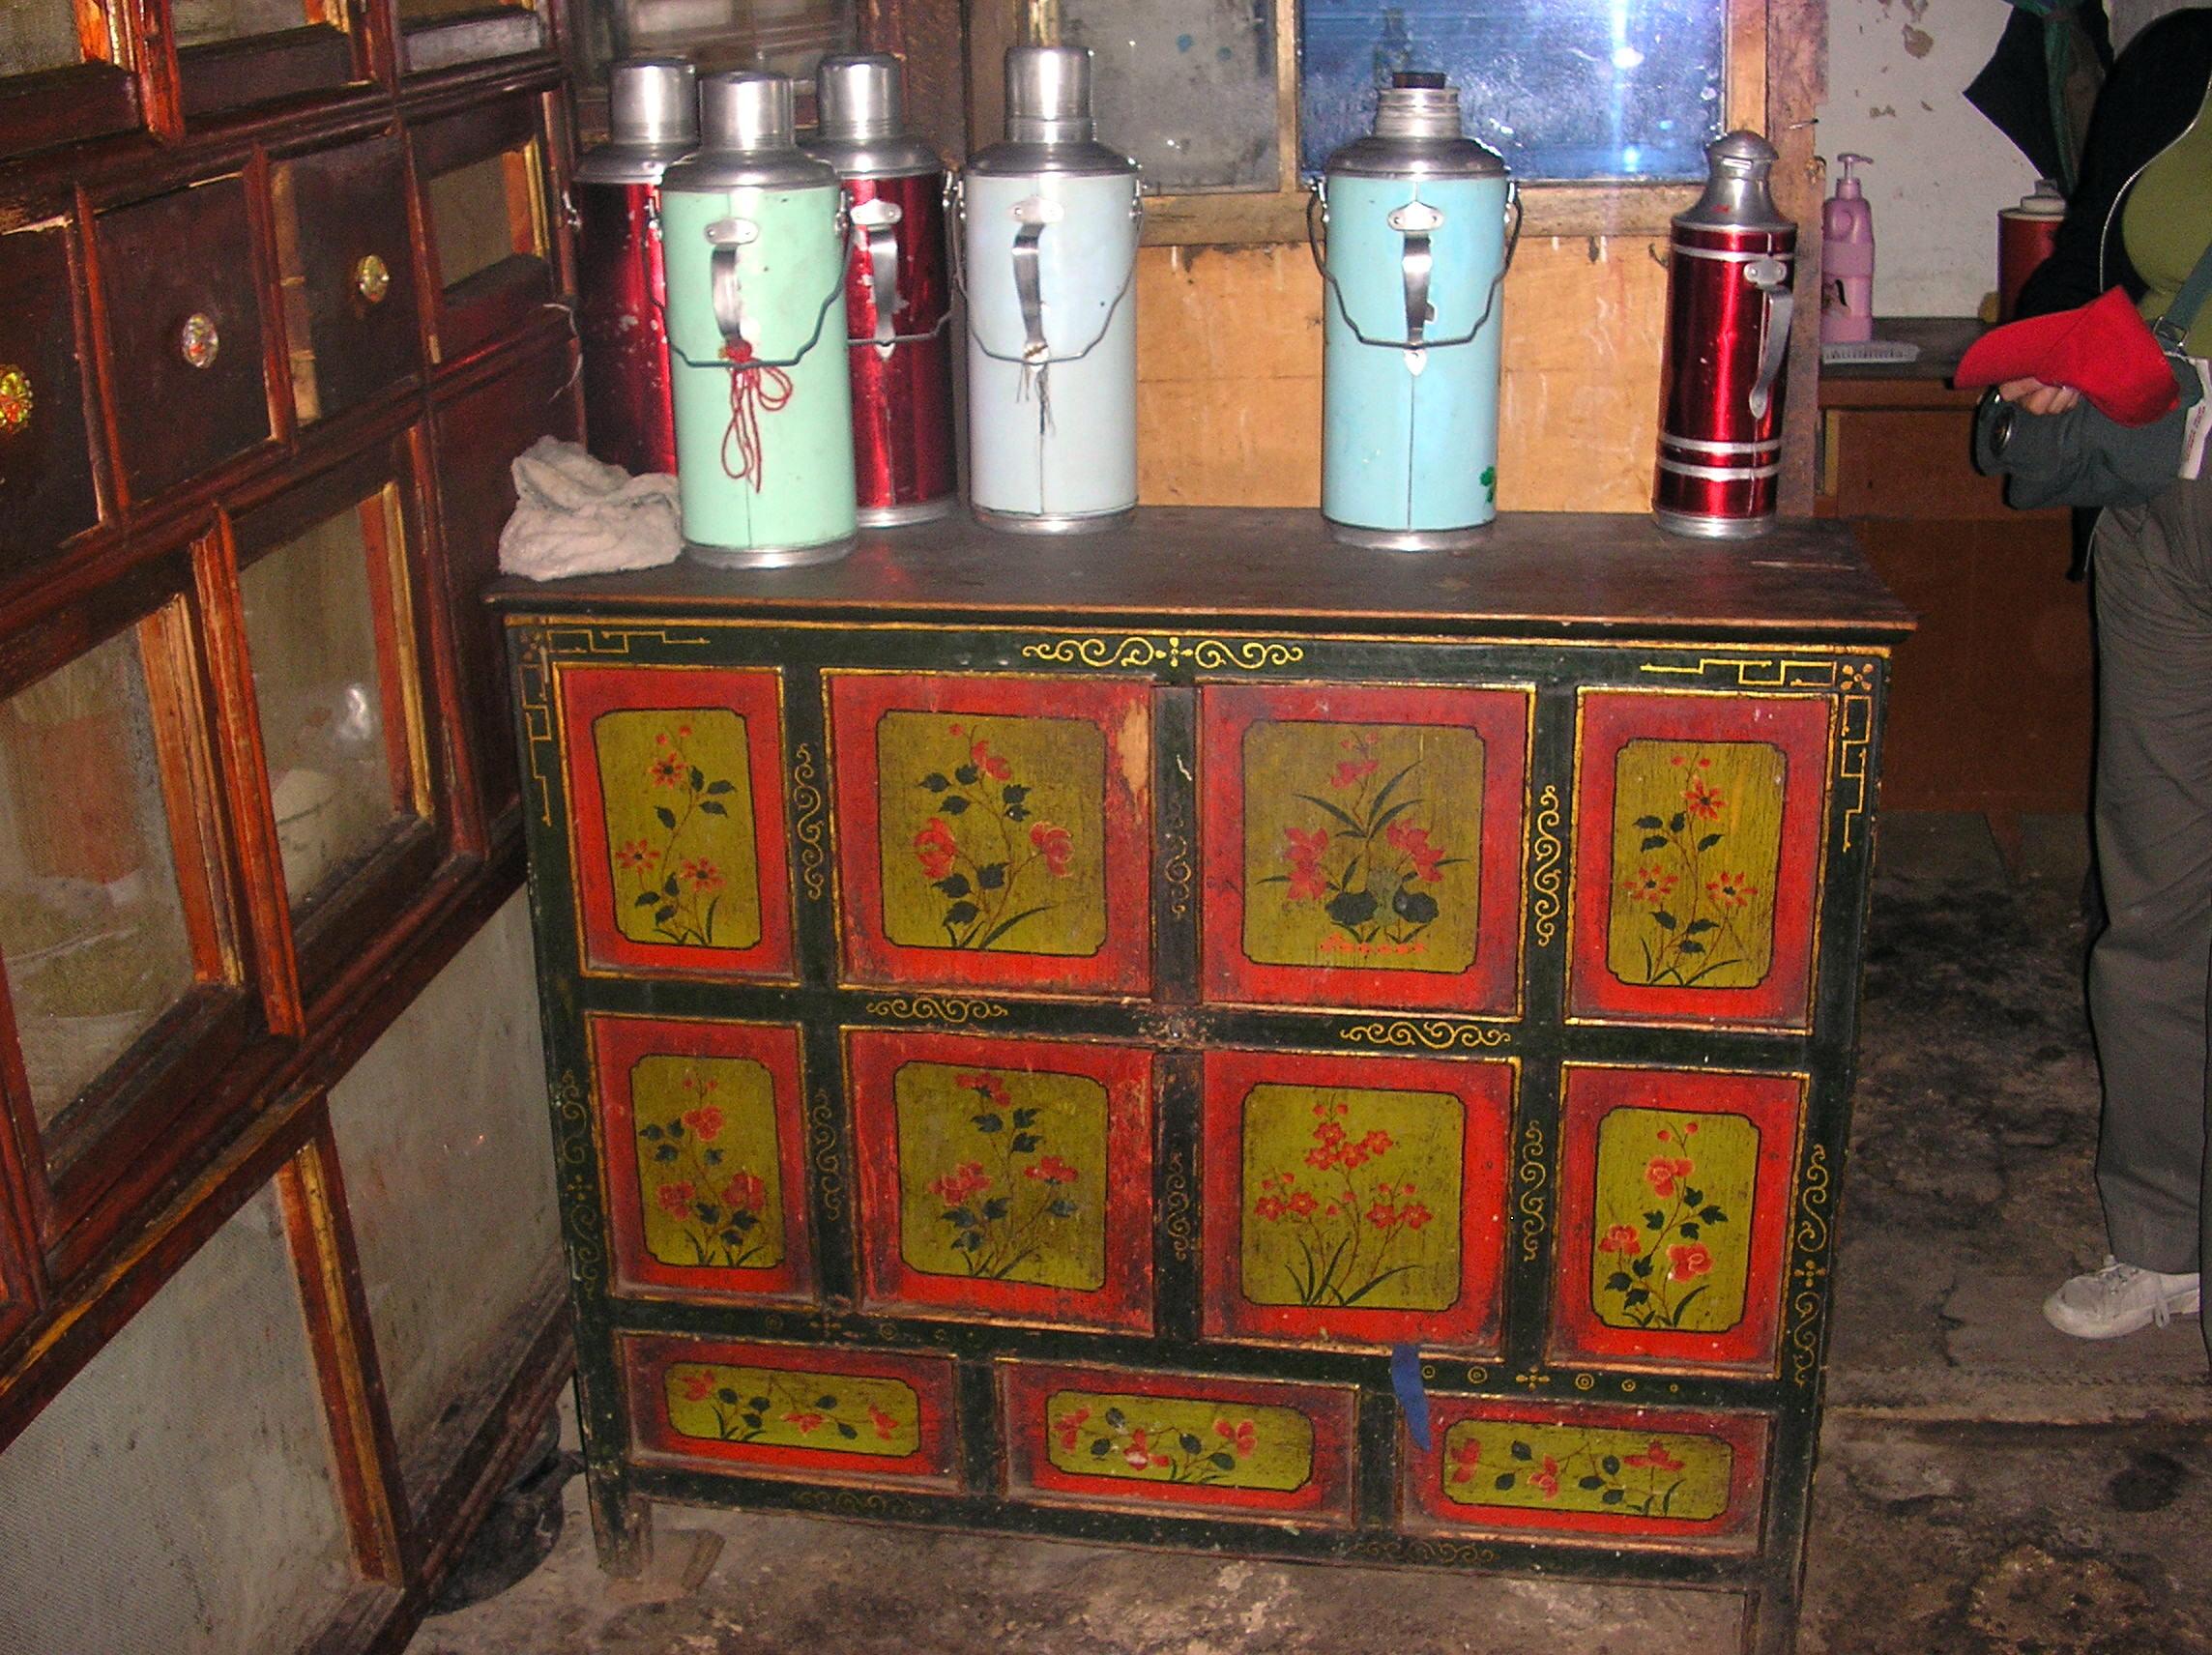 Latitudini mobili introduzione ai mobili tibetani - Mobili tibetani antichi ...